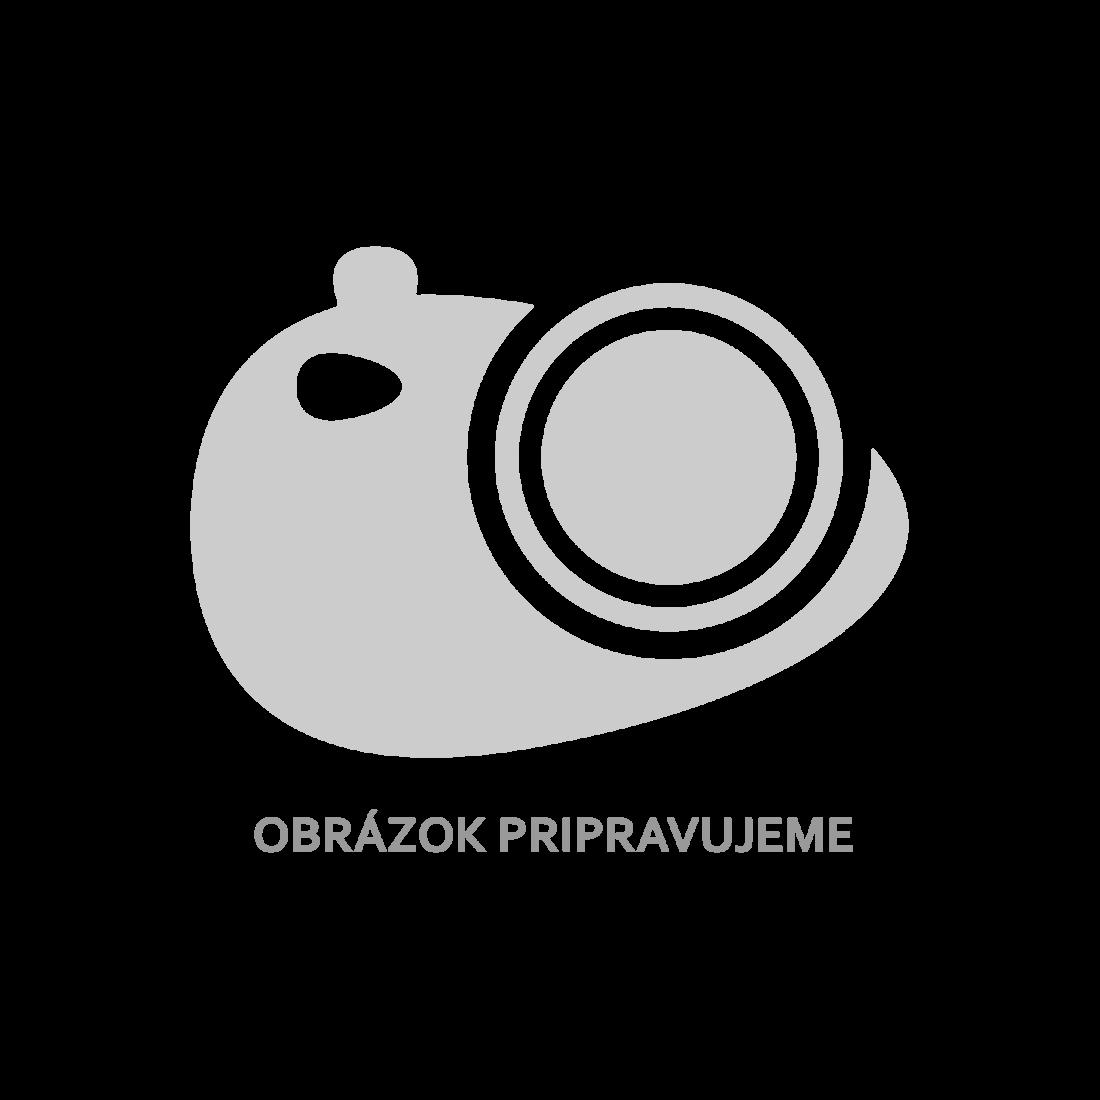 vidaXL TV stolek černý s vysokým leskem 100 x 40 x 40 cm dřevotříska [800052]